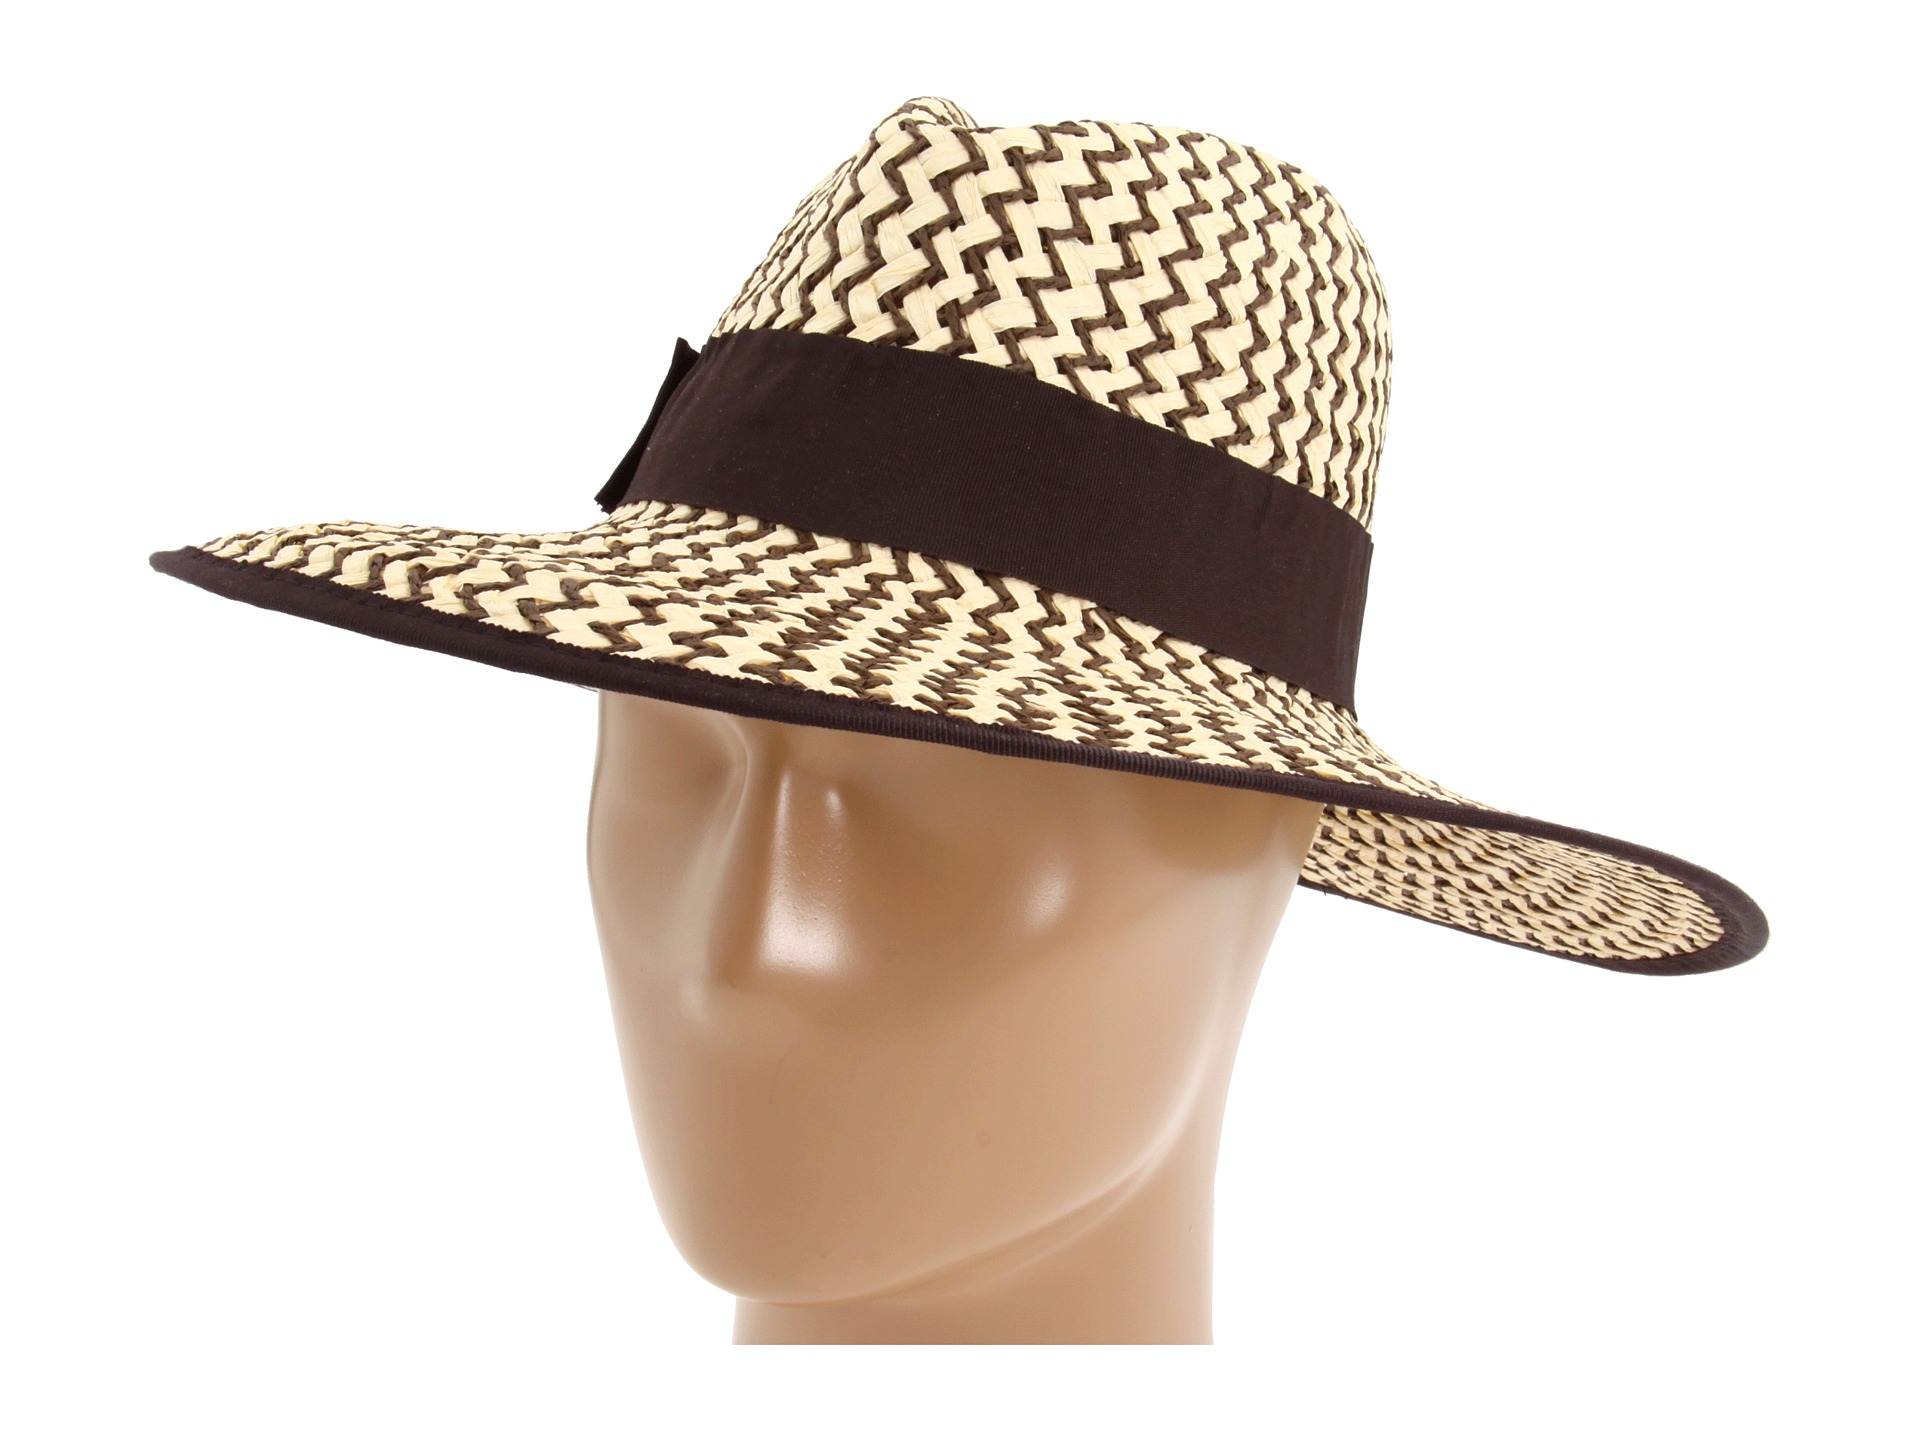 ps黑帽子素材